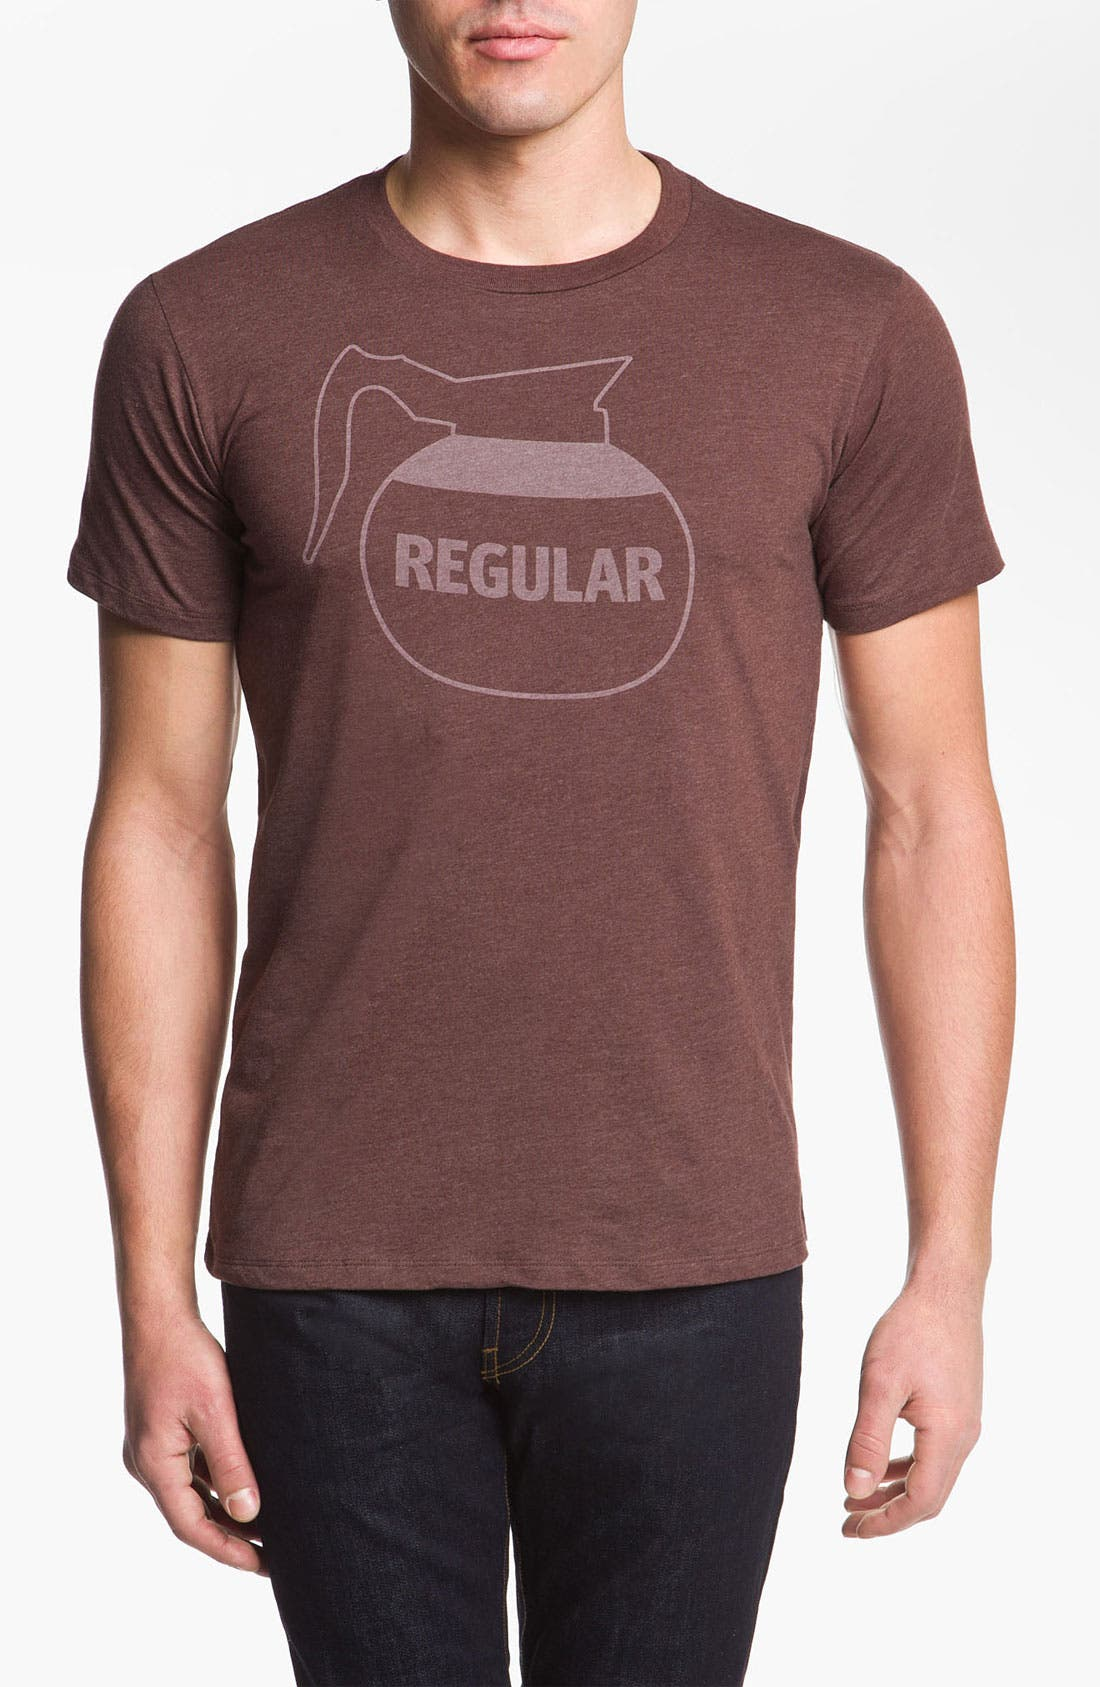 Main Image - Headline Shirts 'Regular' T-Shirt